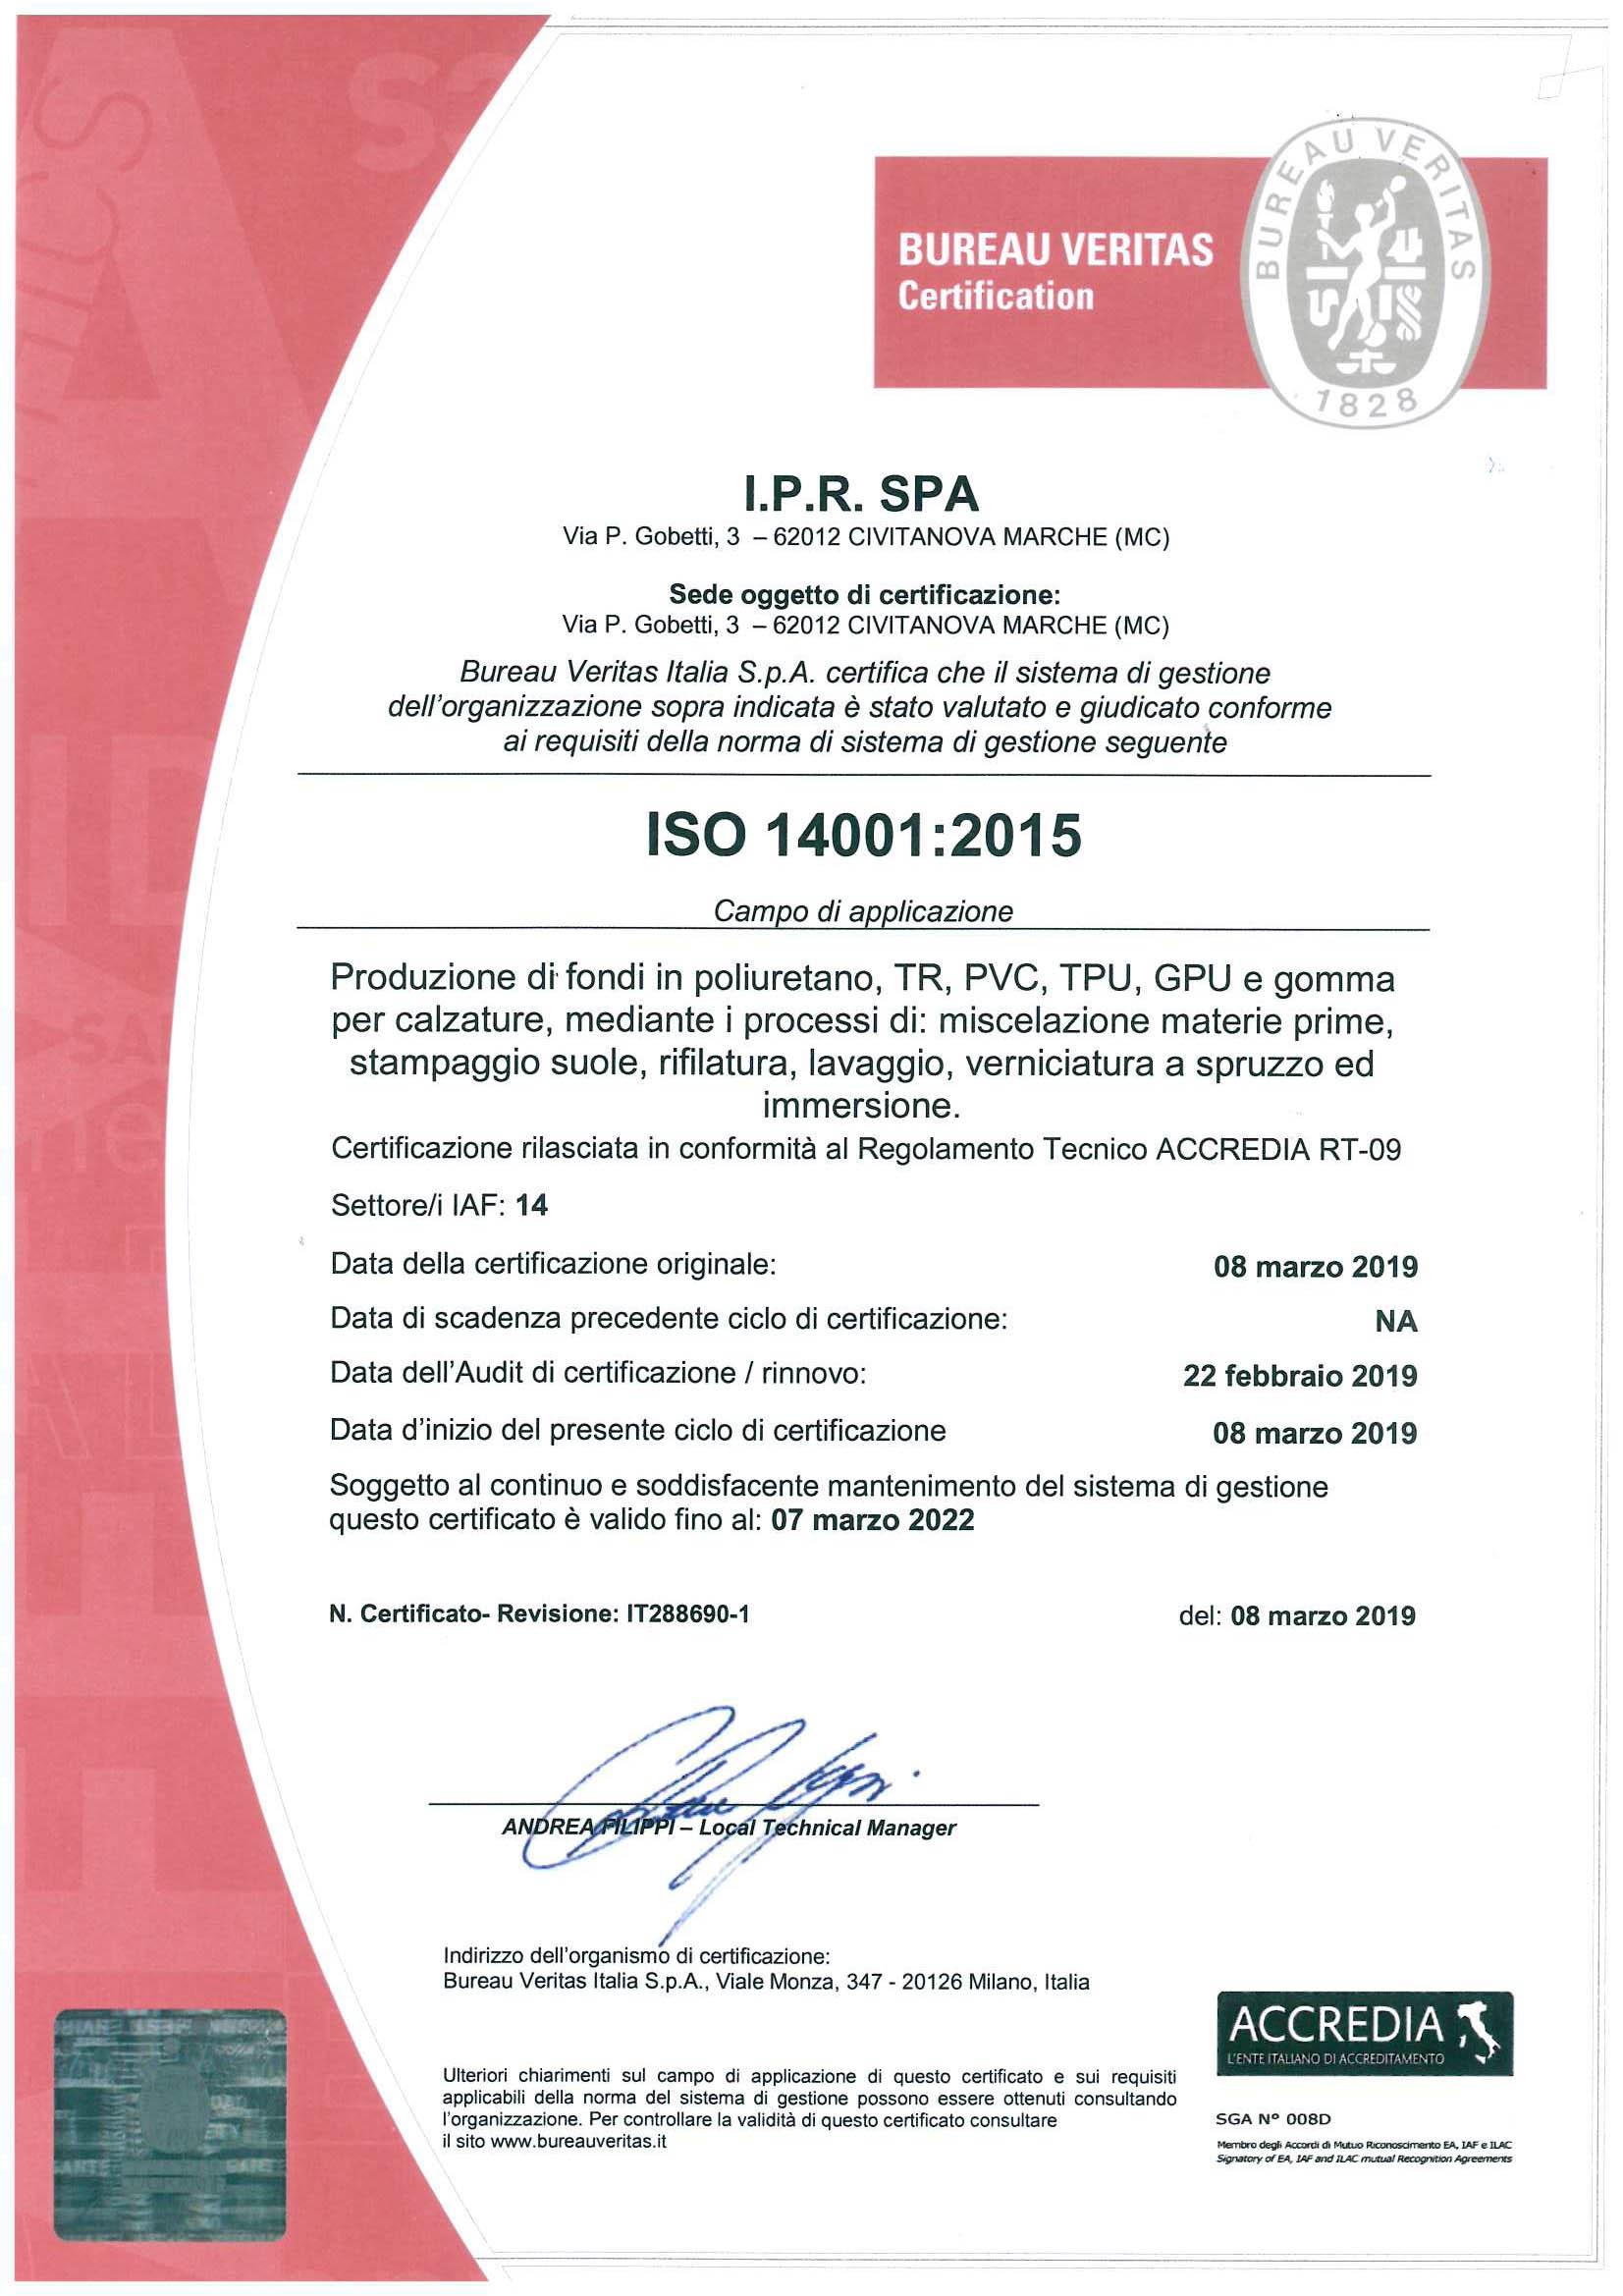 cert_ISO_14001_2015_ita